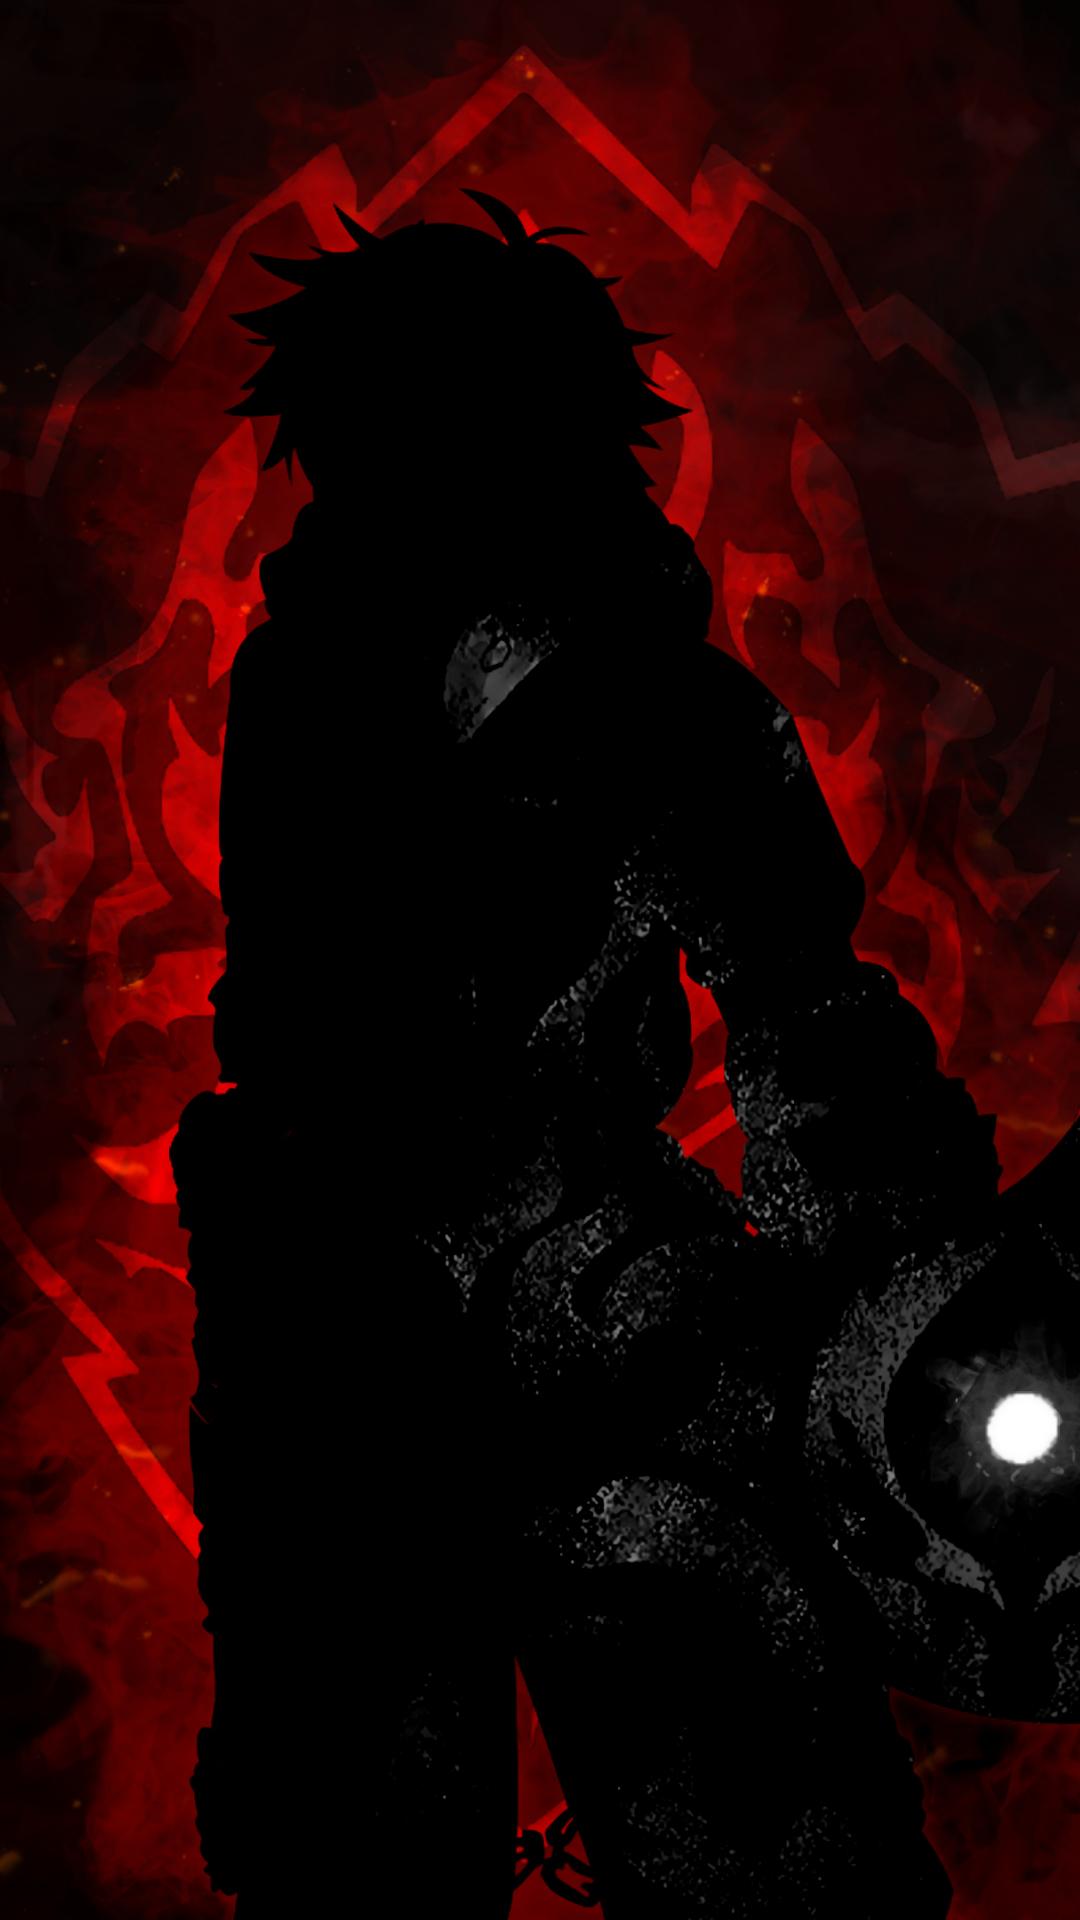 Dark Anime Wallpaper 4k , HD Wallpaper & Backgrounds